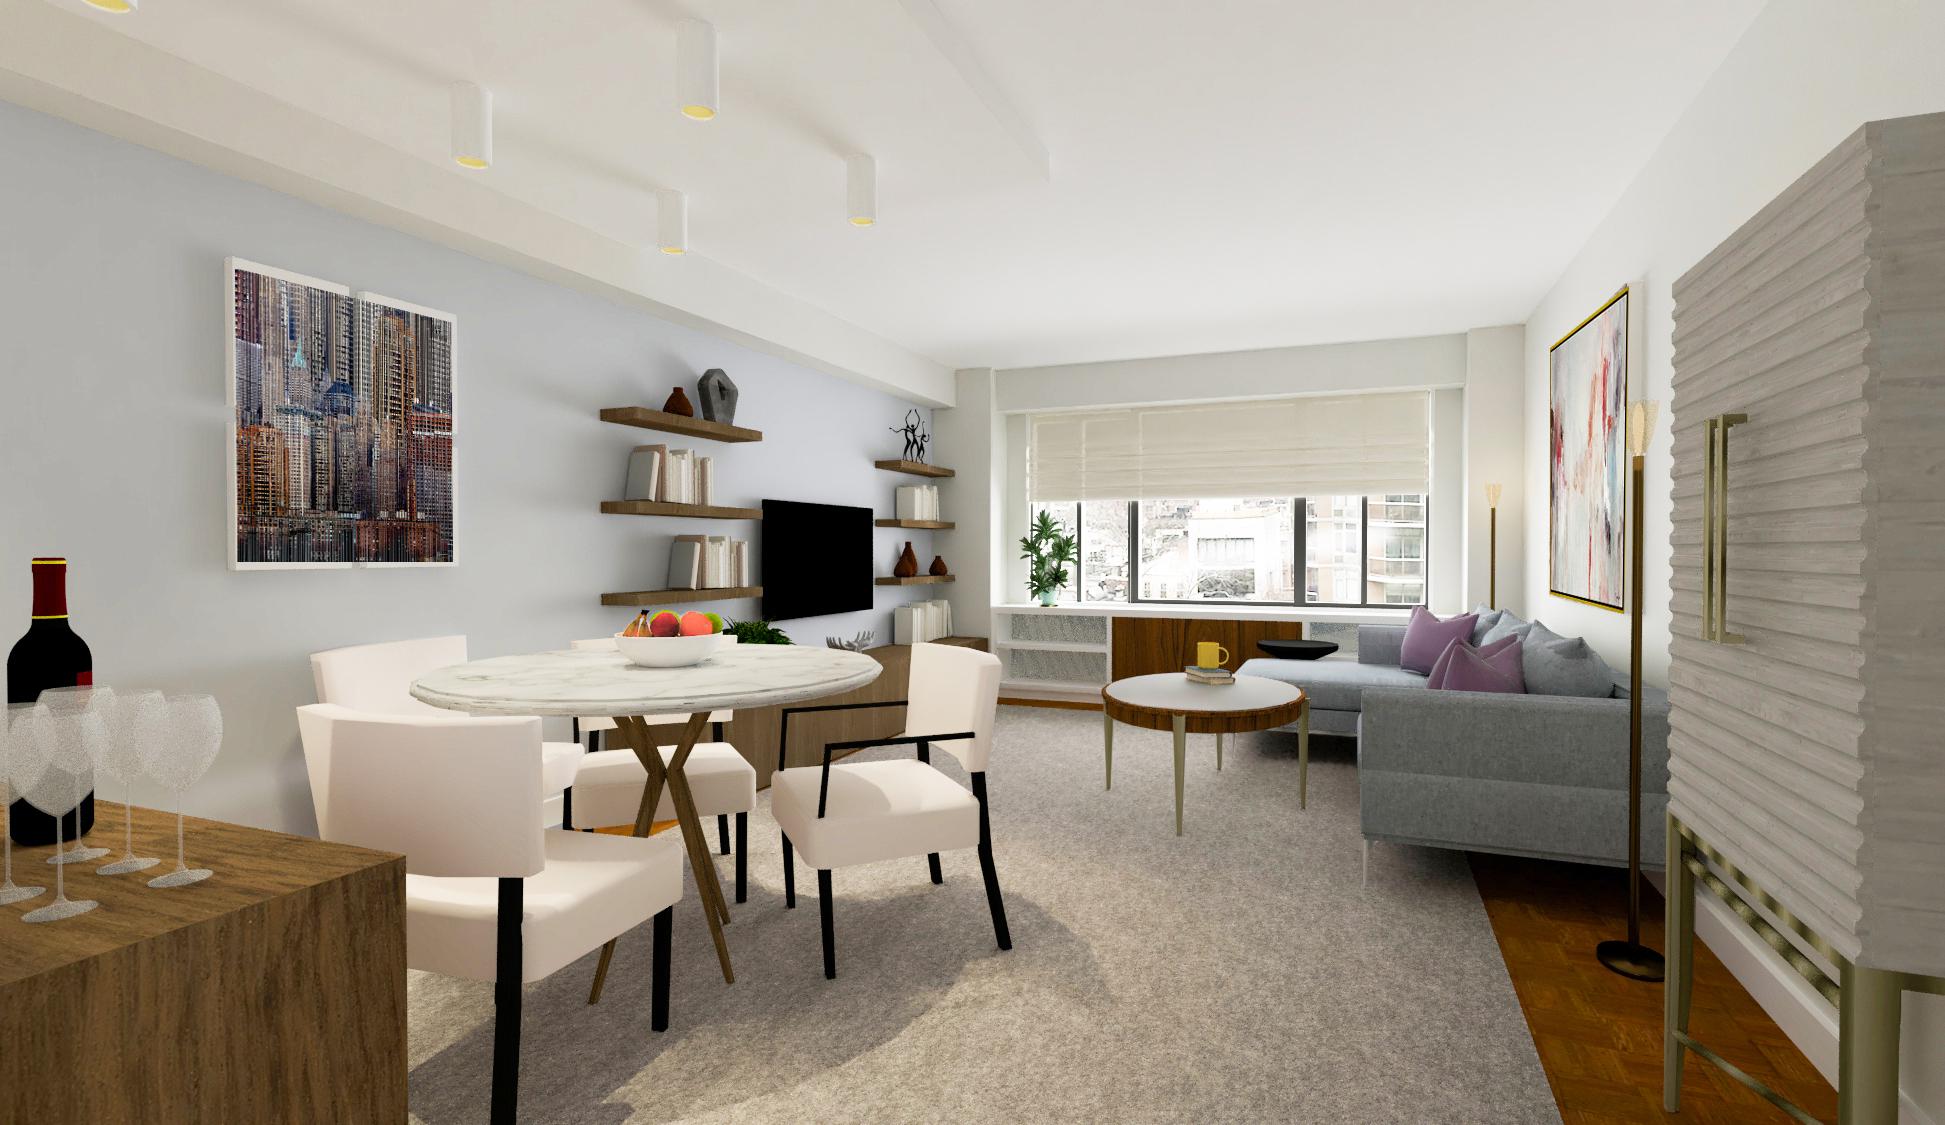 Greenbaum Livingroom with ART2.jpg